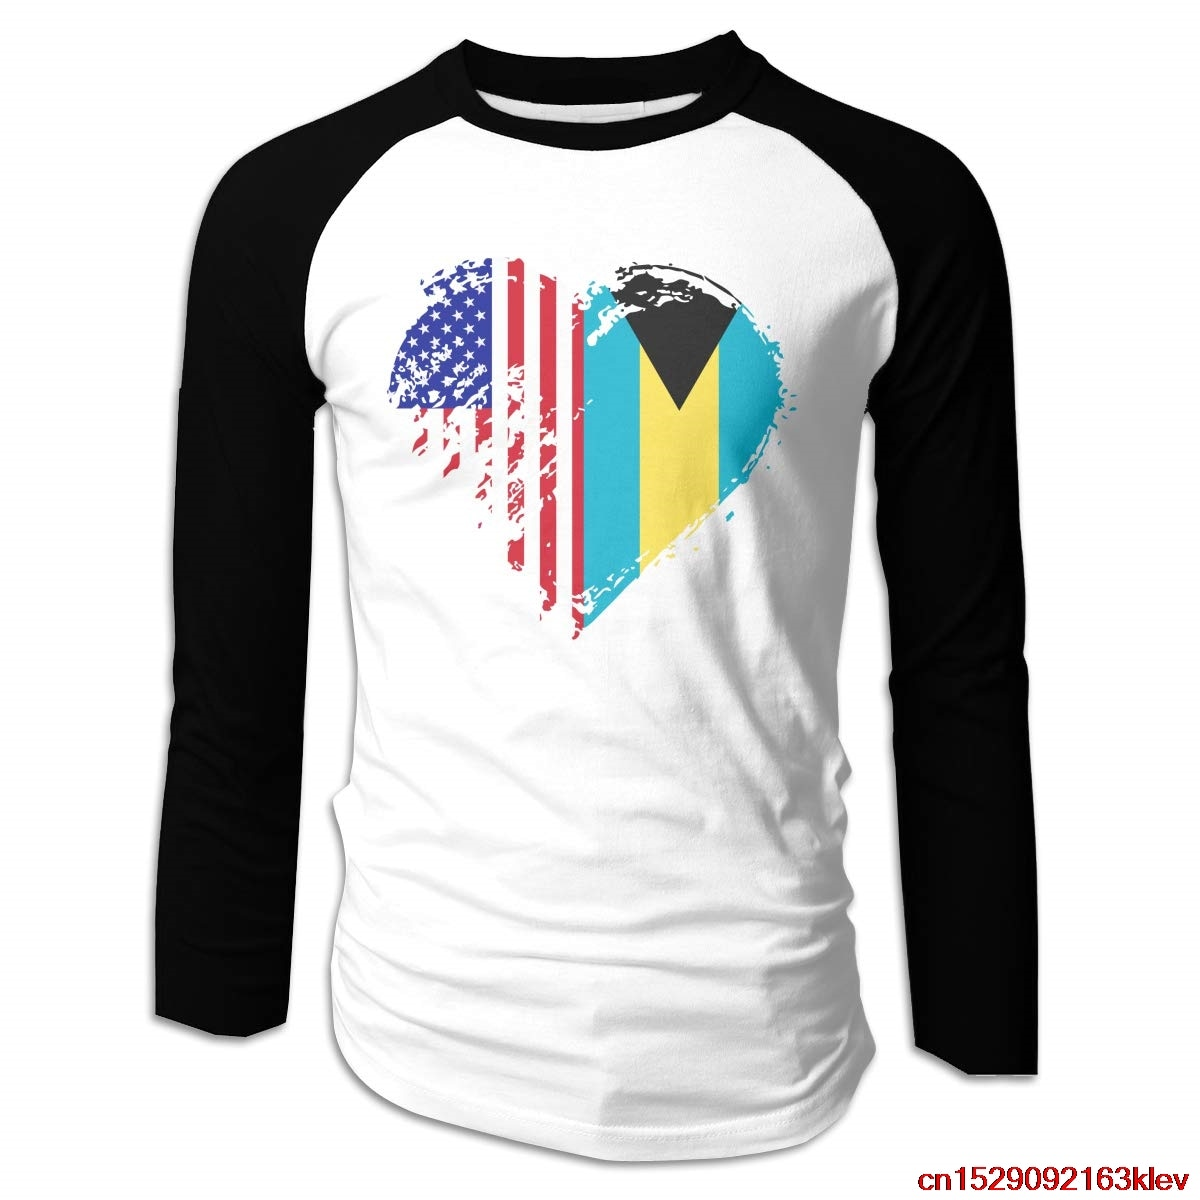 FGHFG Grungy Bahamas American Flag Heart Long Sleeve Baseball Tee for Men,Cotton Raglan Jersey Shirt Unisex men women t shirt